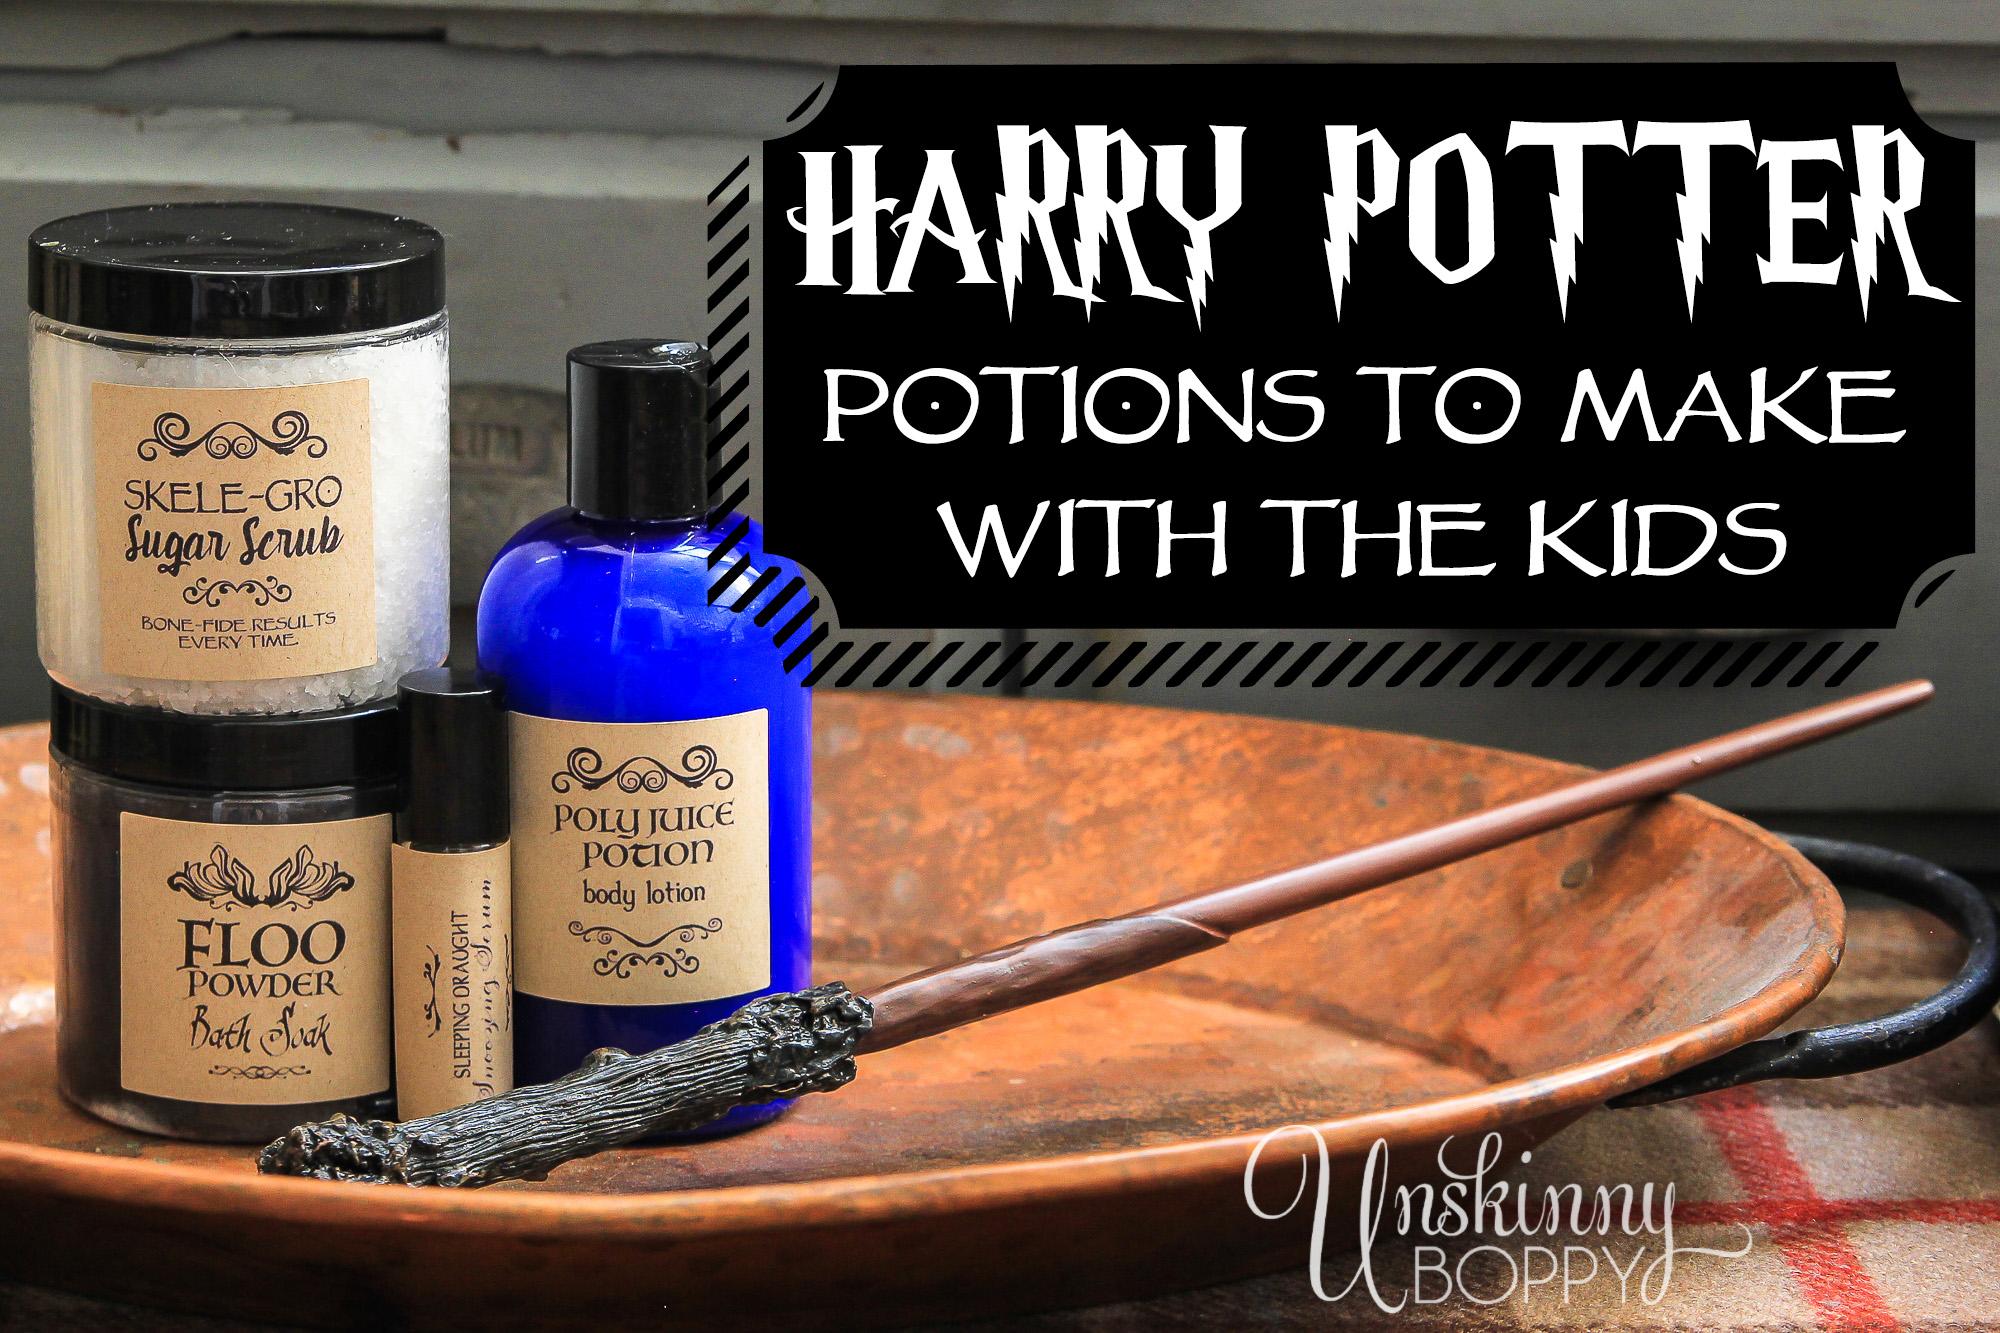 Harry Potter Bath Body Potion Recipes